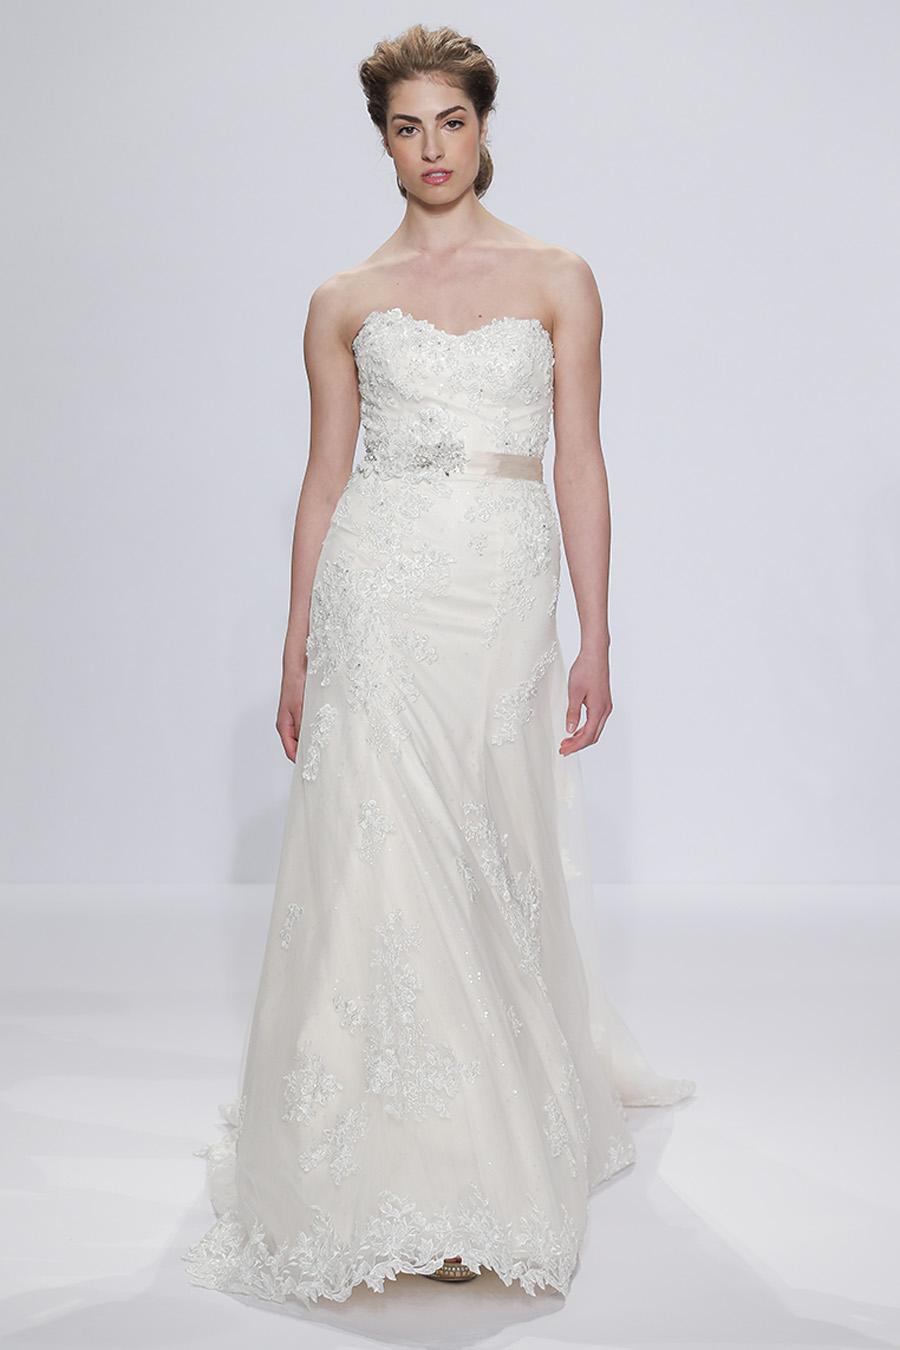 Randy Fenoli Bridal Collection gown 16